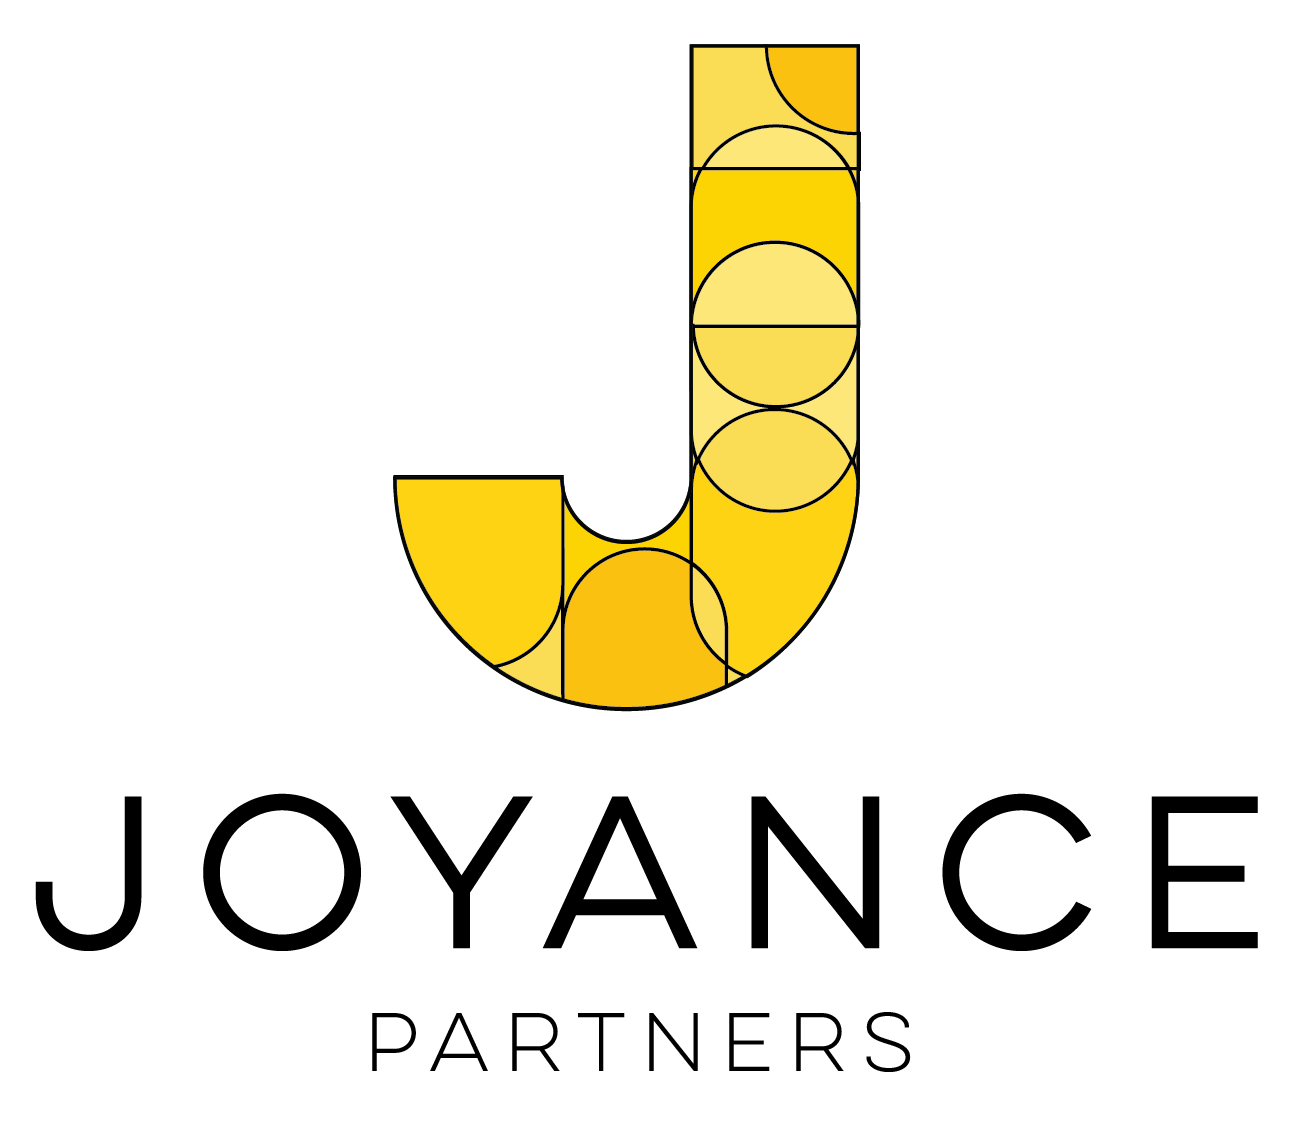 JoyanceLogos-01.png